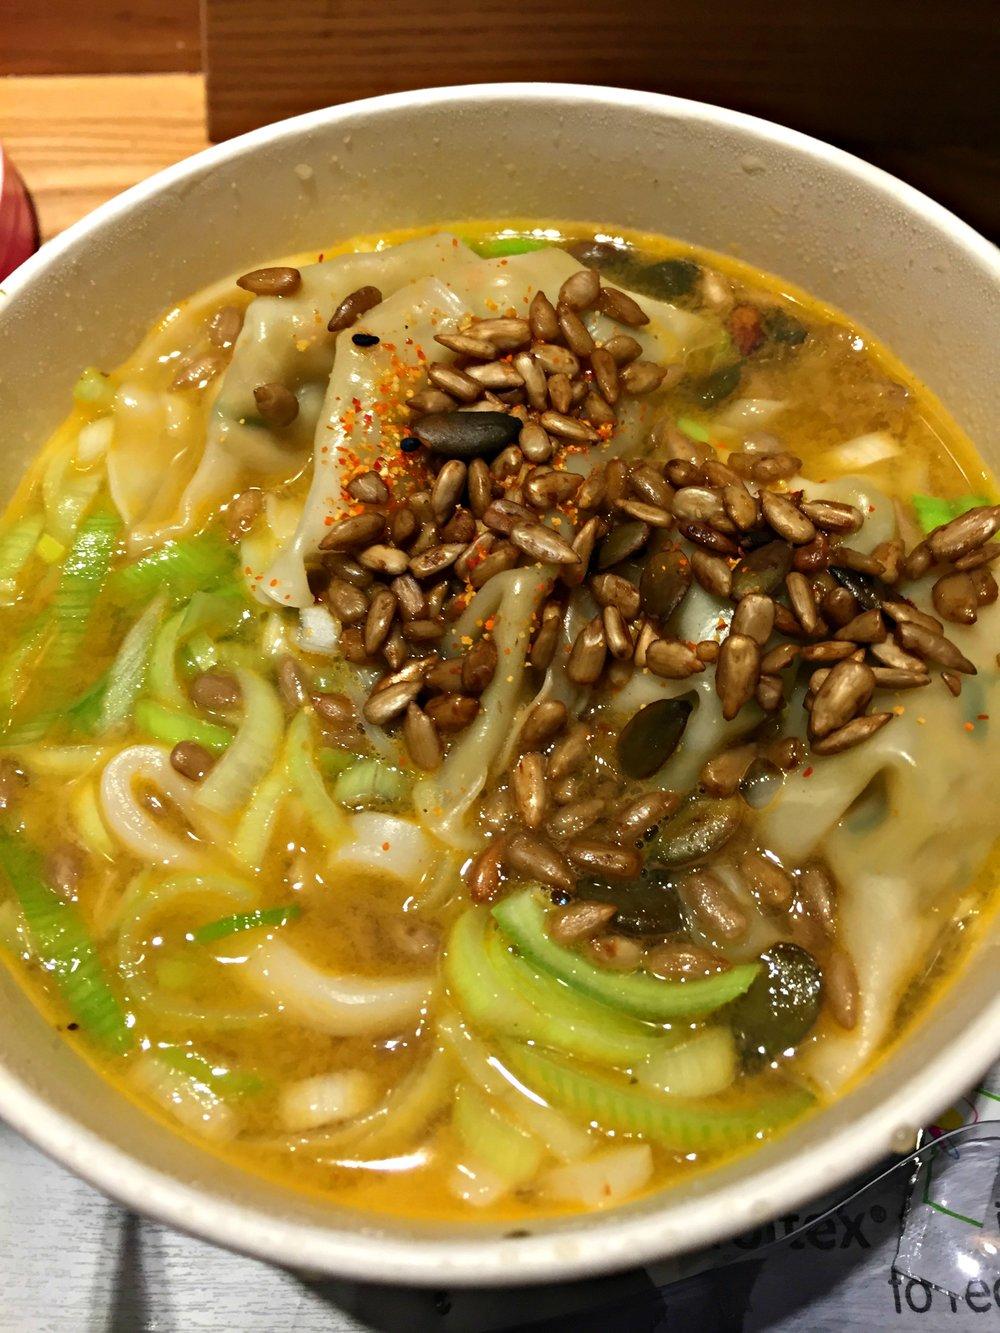 Lunch: Itsu vegetable udon noodles